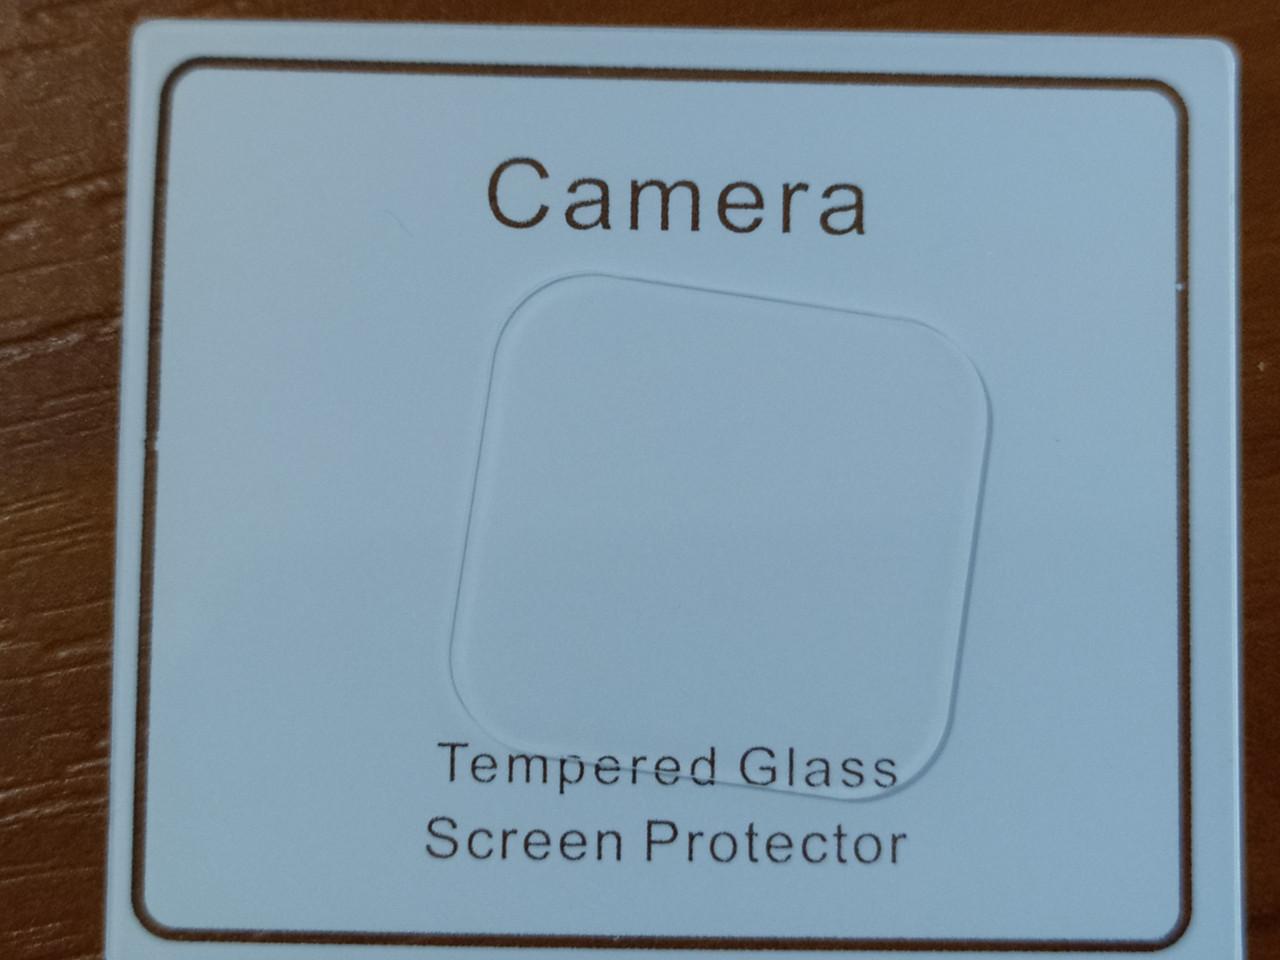 Защитное стекло на камеру Tempered Glass Screen Protector  Xiaomi Redmi Note 9